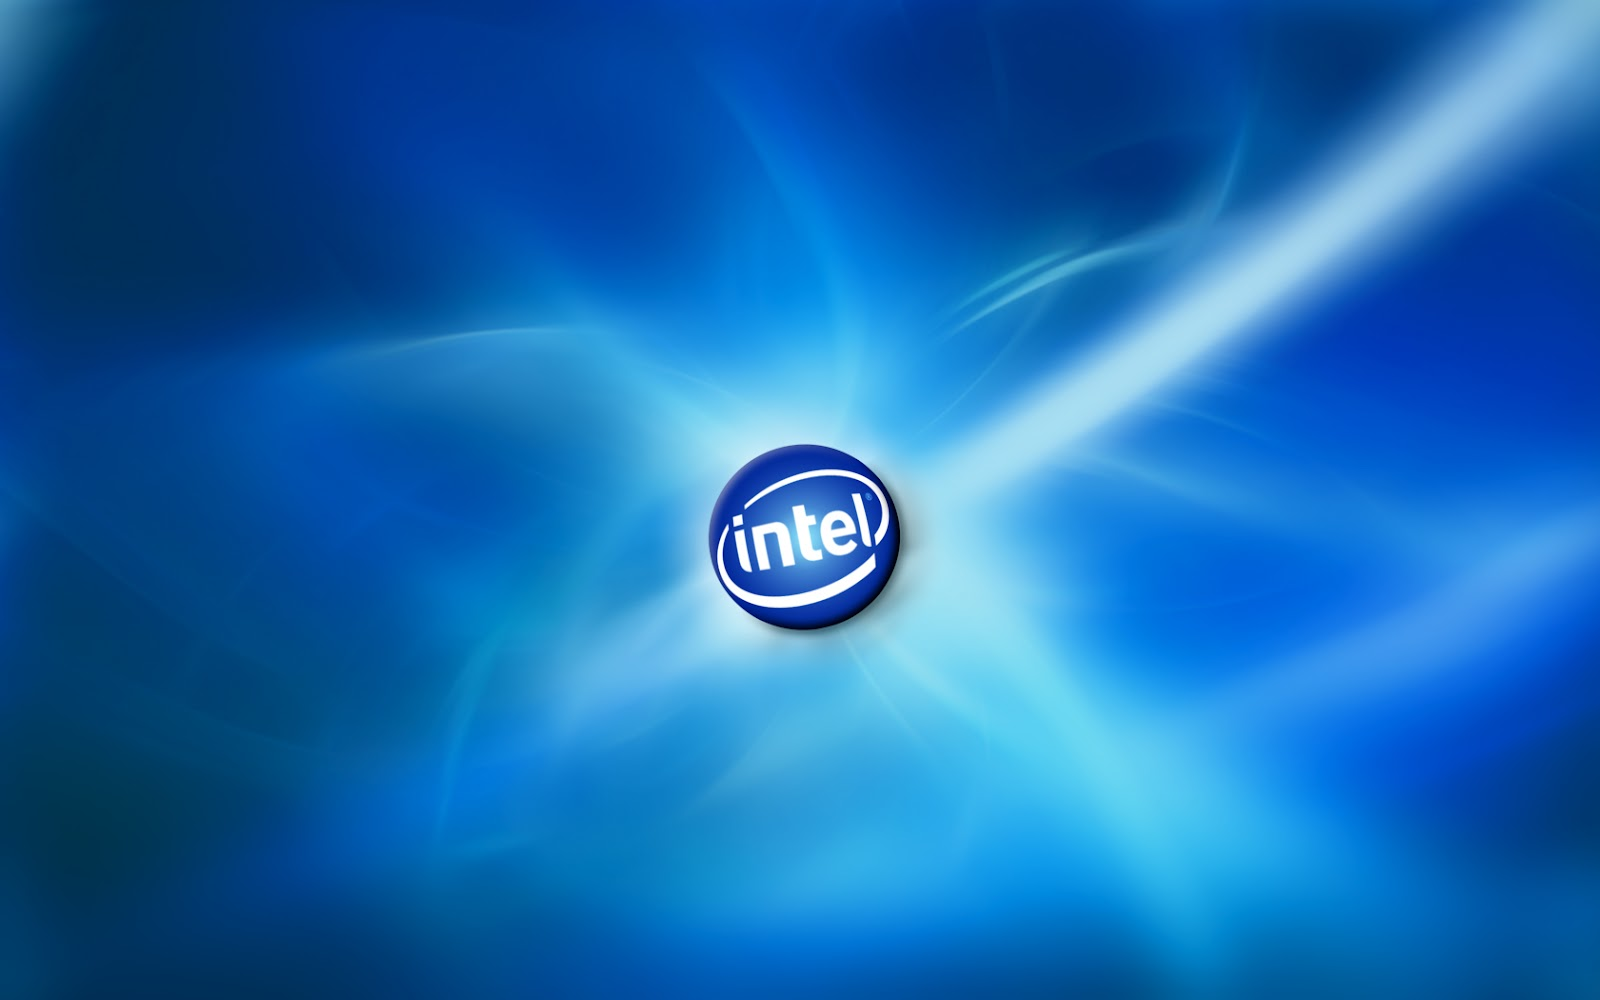 Amazing Wallpapers Intel i5 logo intel logo download intel logo 1600x1000